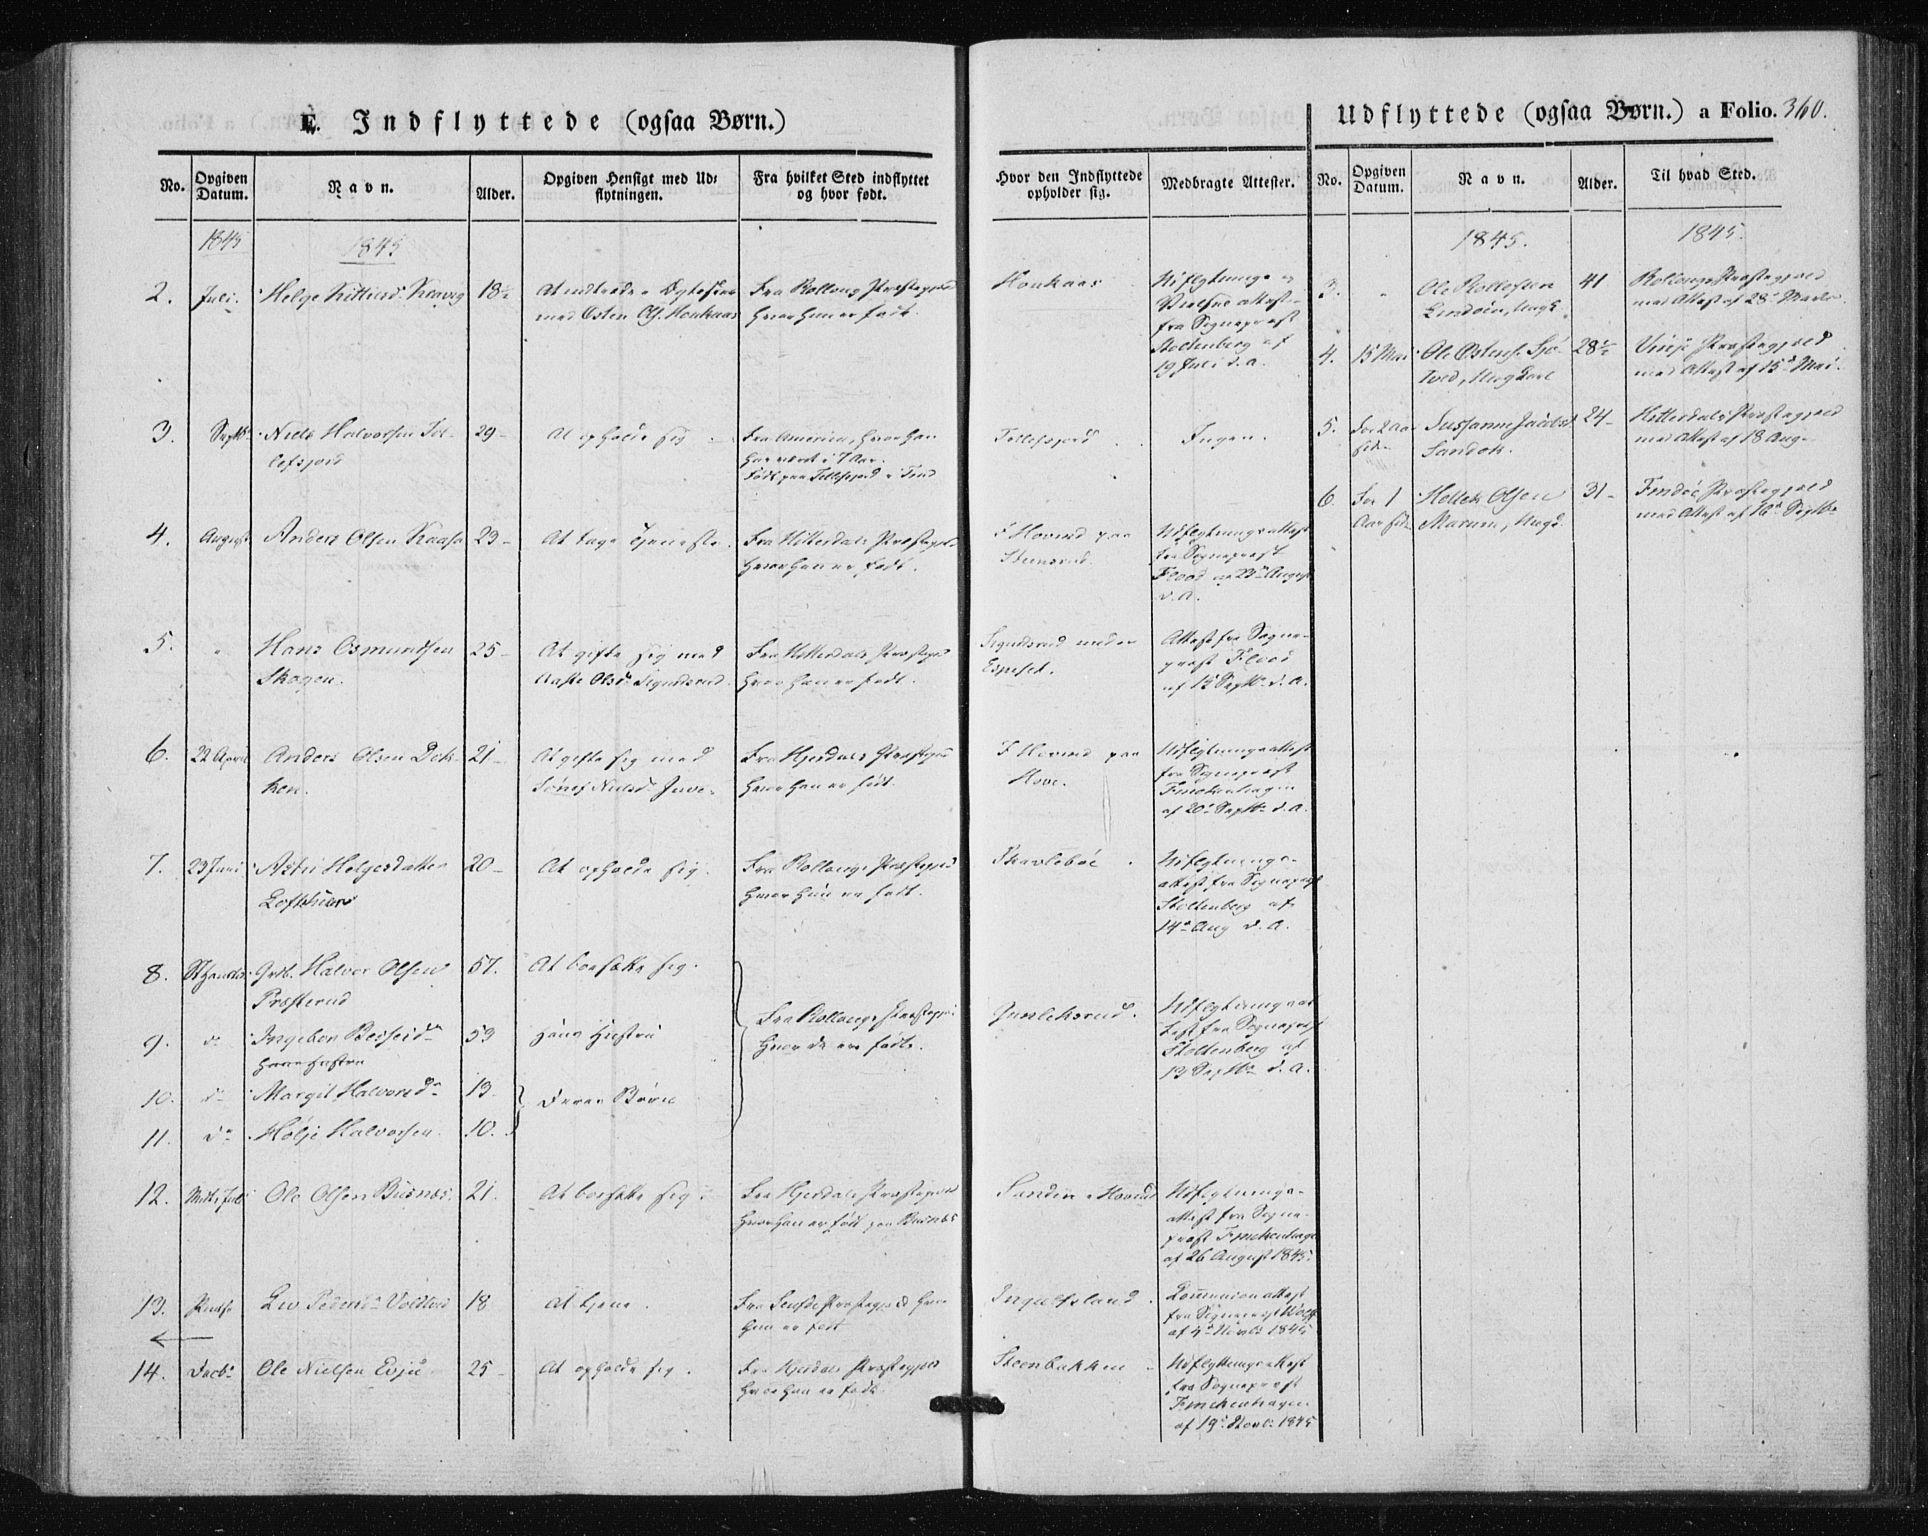 SAKO, Tinn kirkebøker, F/Fa/L0005: Ministerialbok nr. I 5, 1844-1856, s. 360